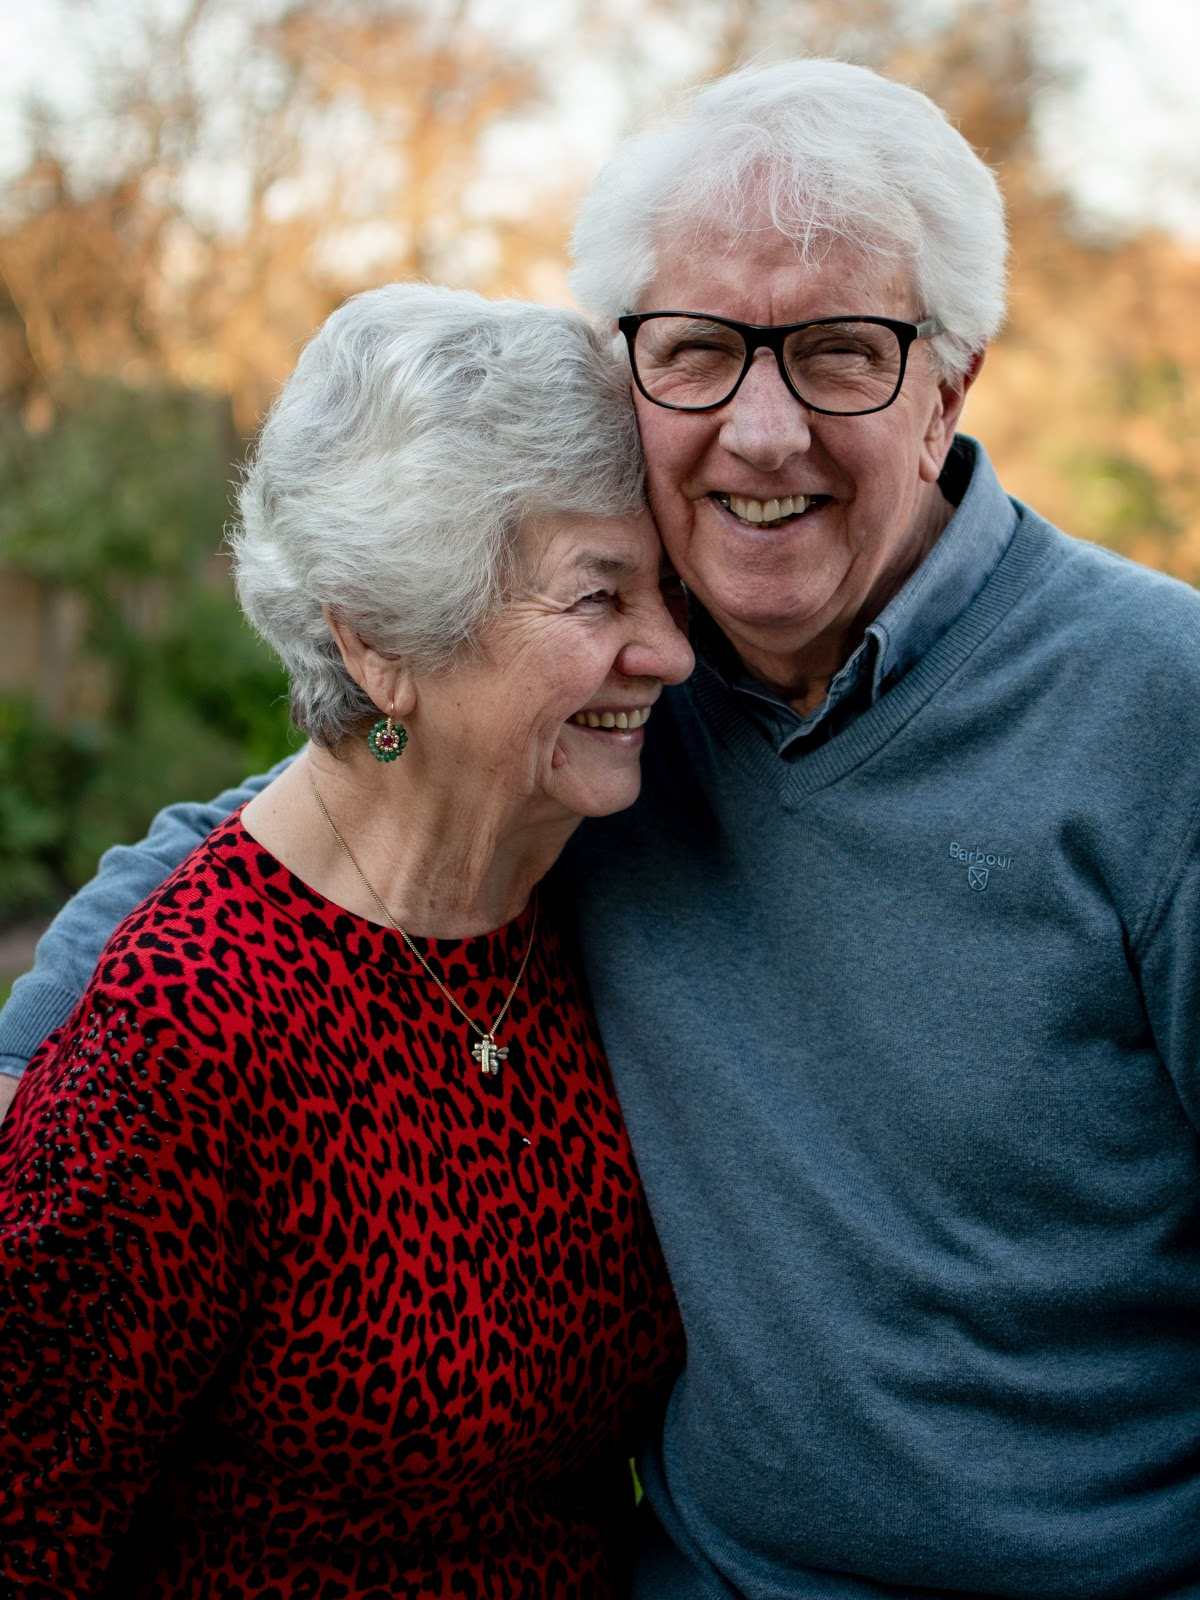 Older adult couple smiling